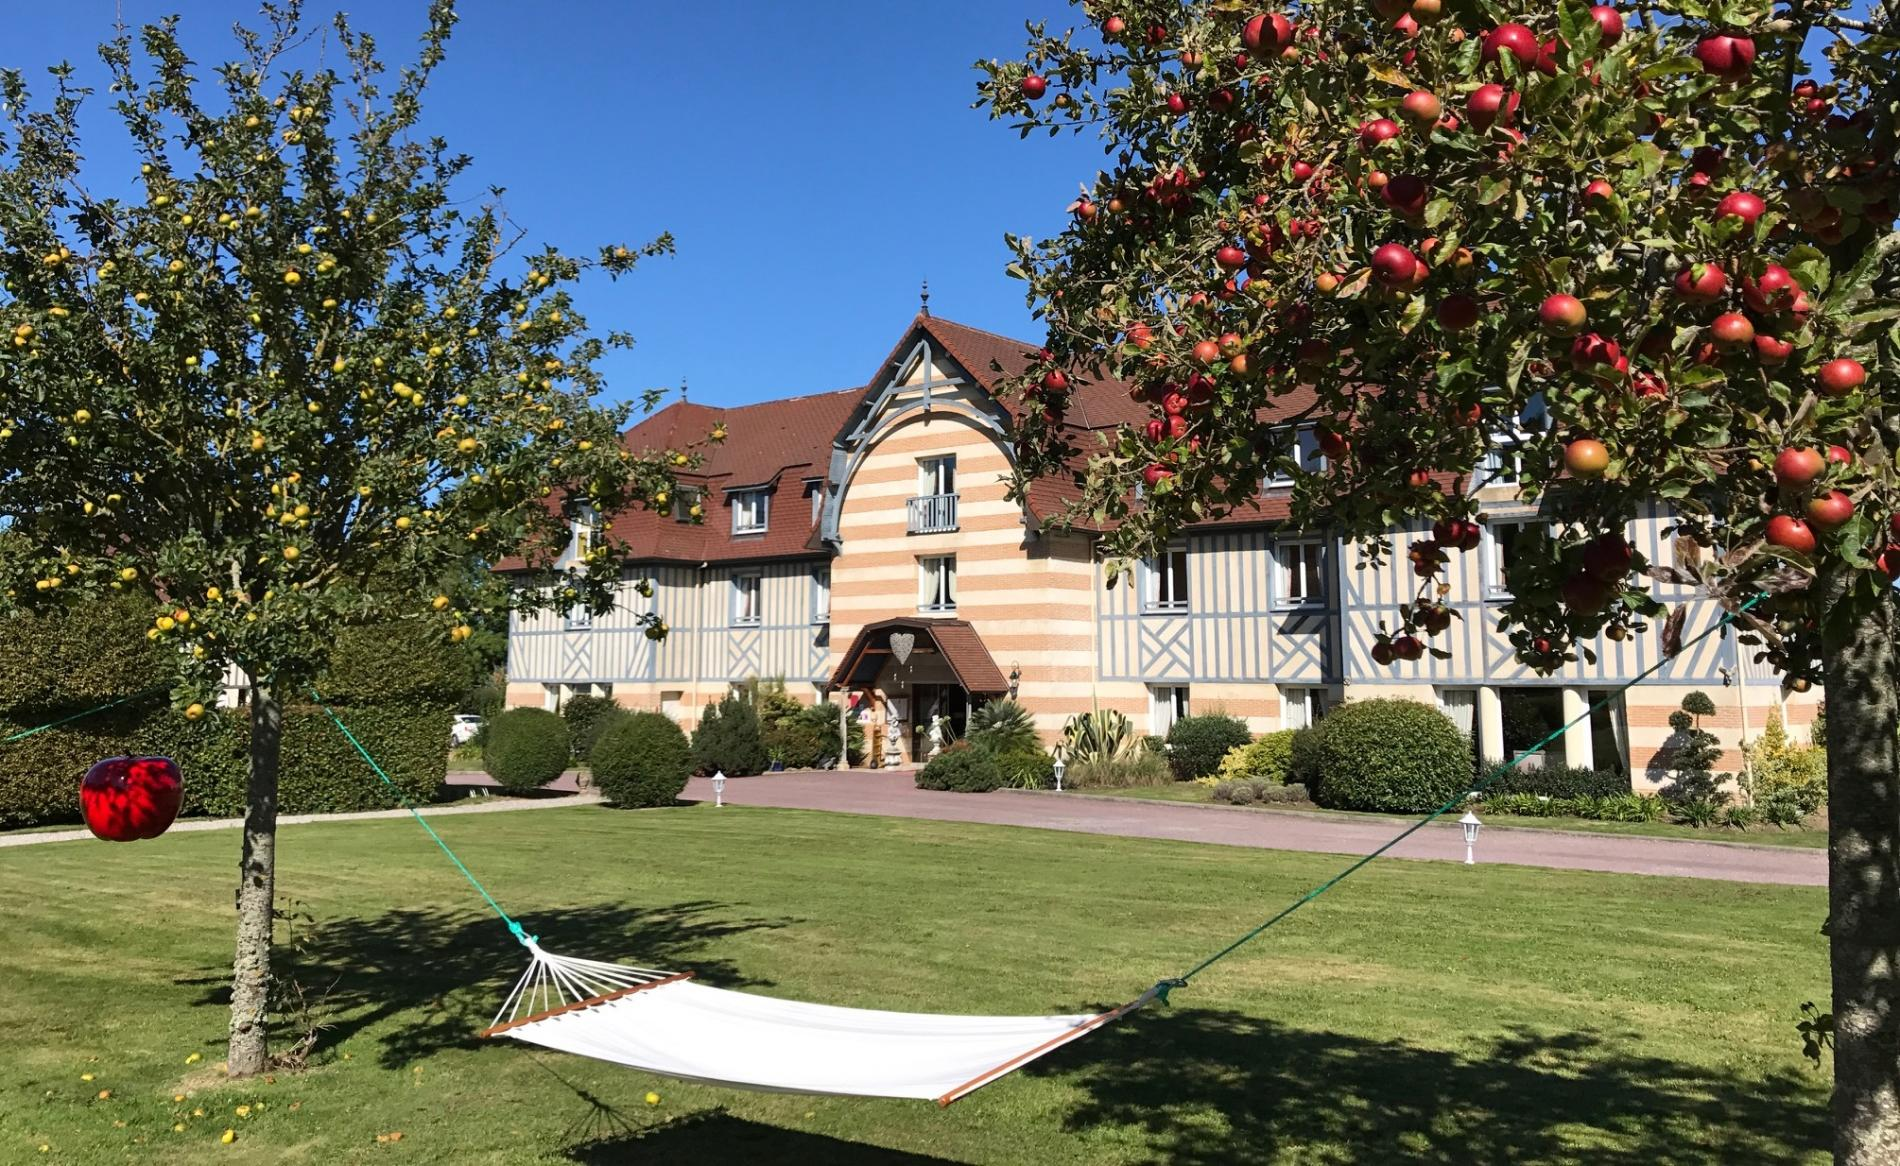 Manoir de la Poterie - Hotel de charme en Normandie